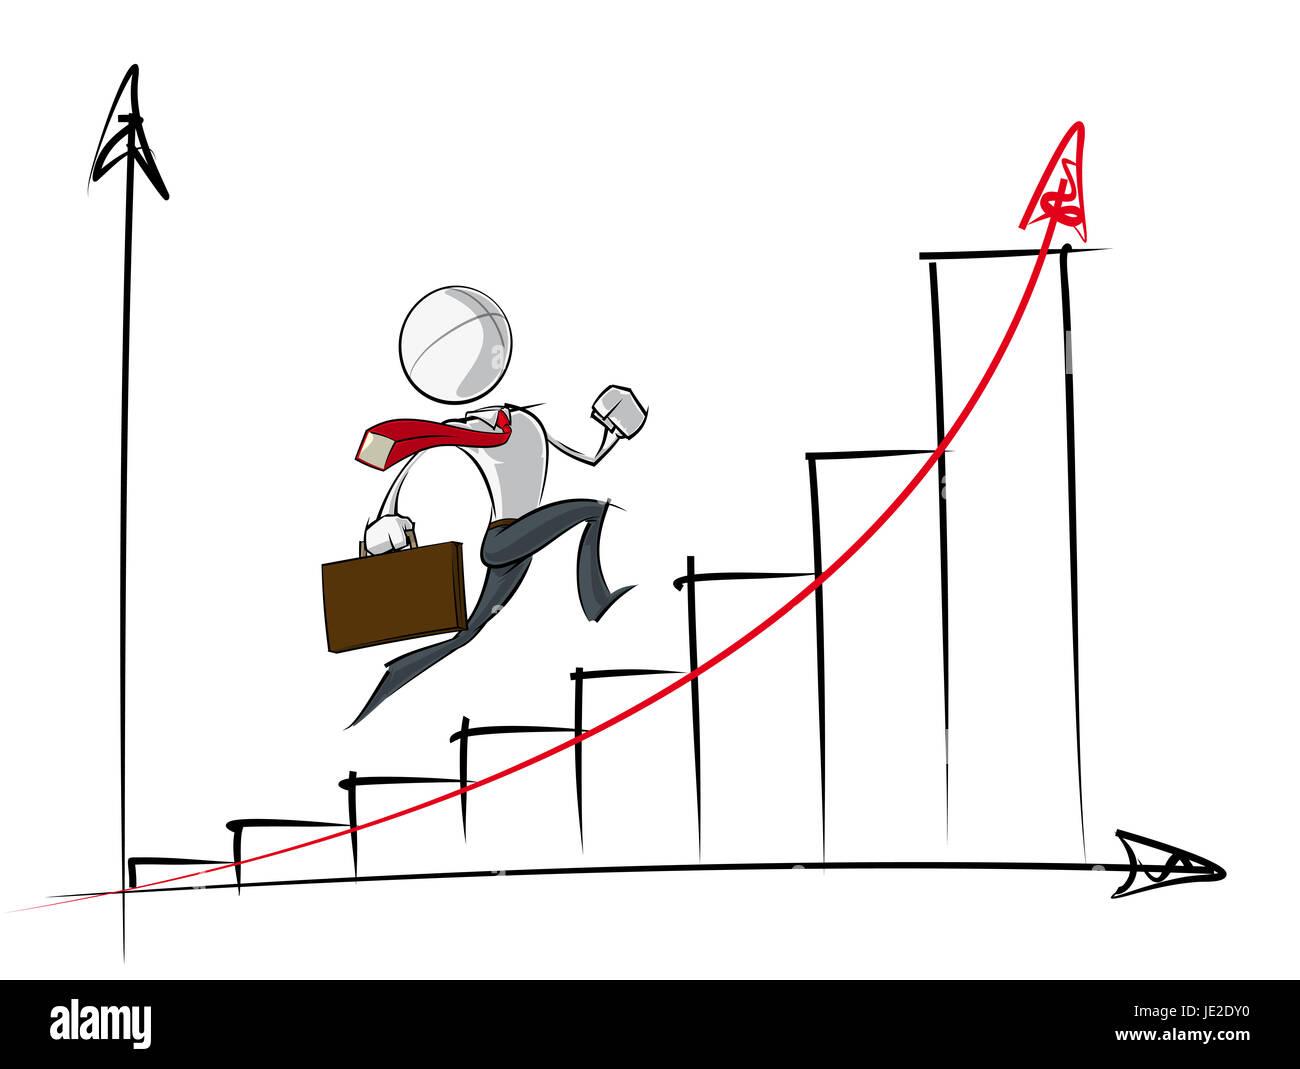 accounting cartoon stockfotos accounting cartoon bilder alamy. Black Bedroom Furniture Sets. Home Design Ideas